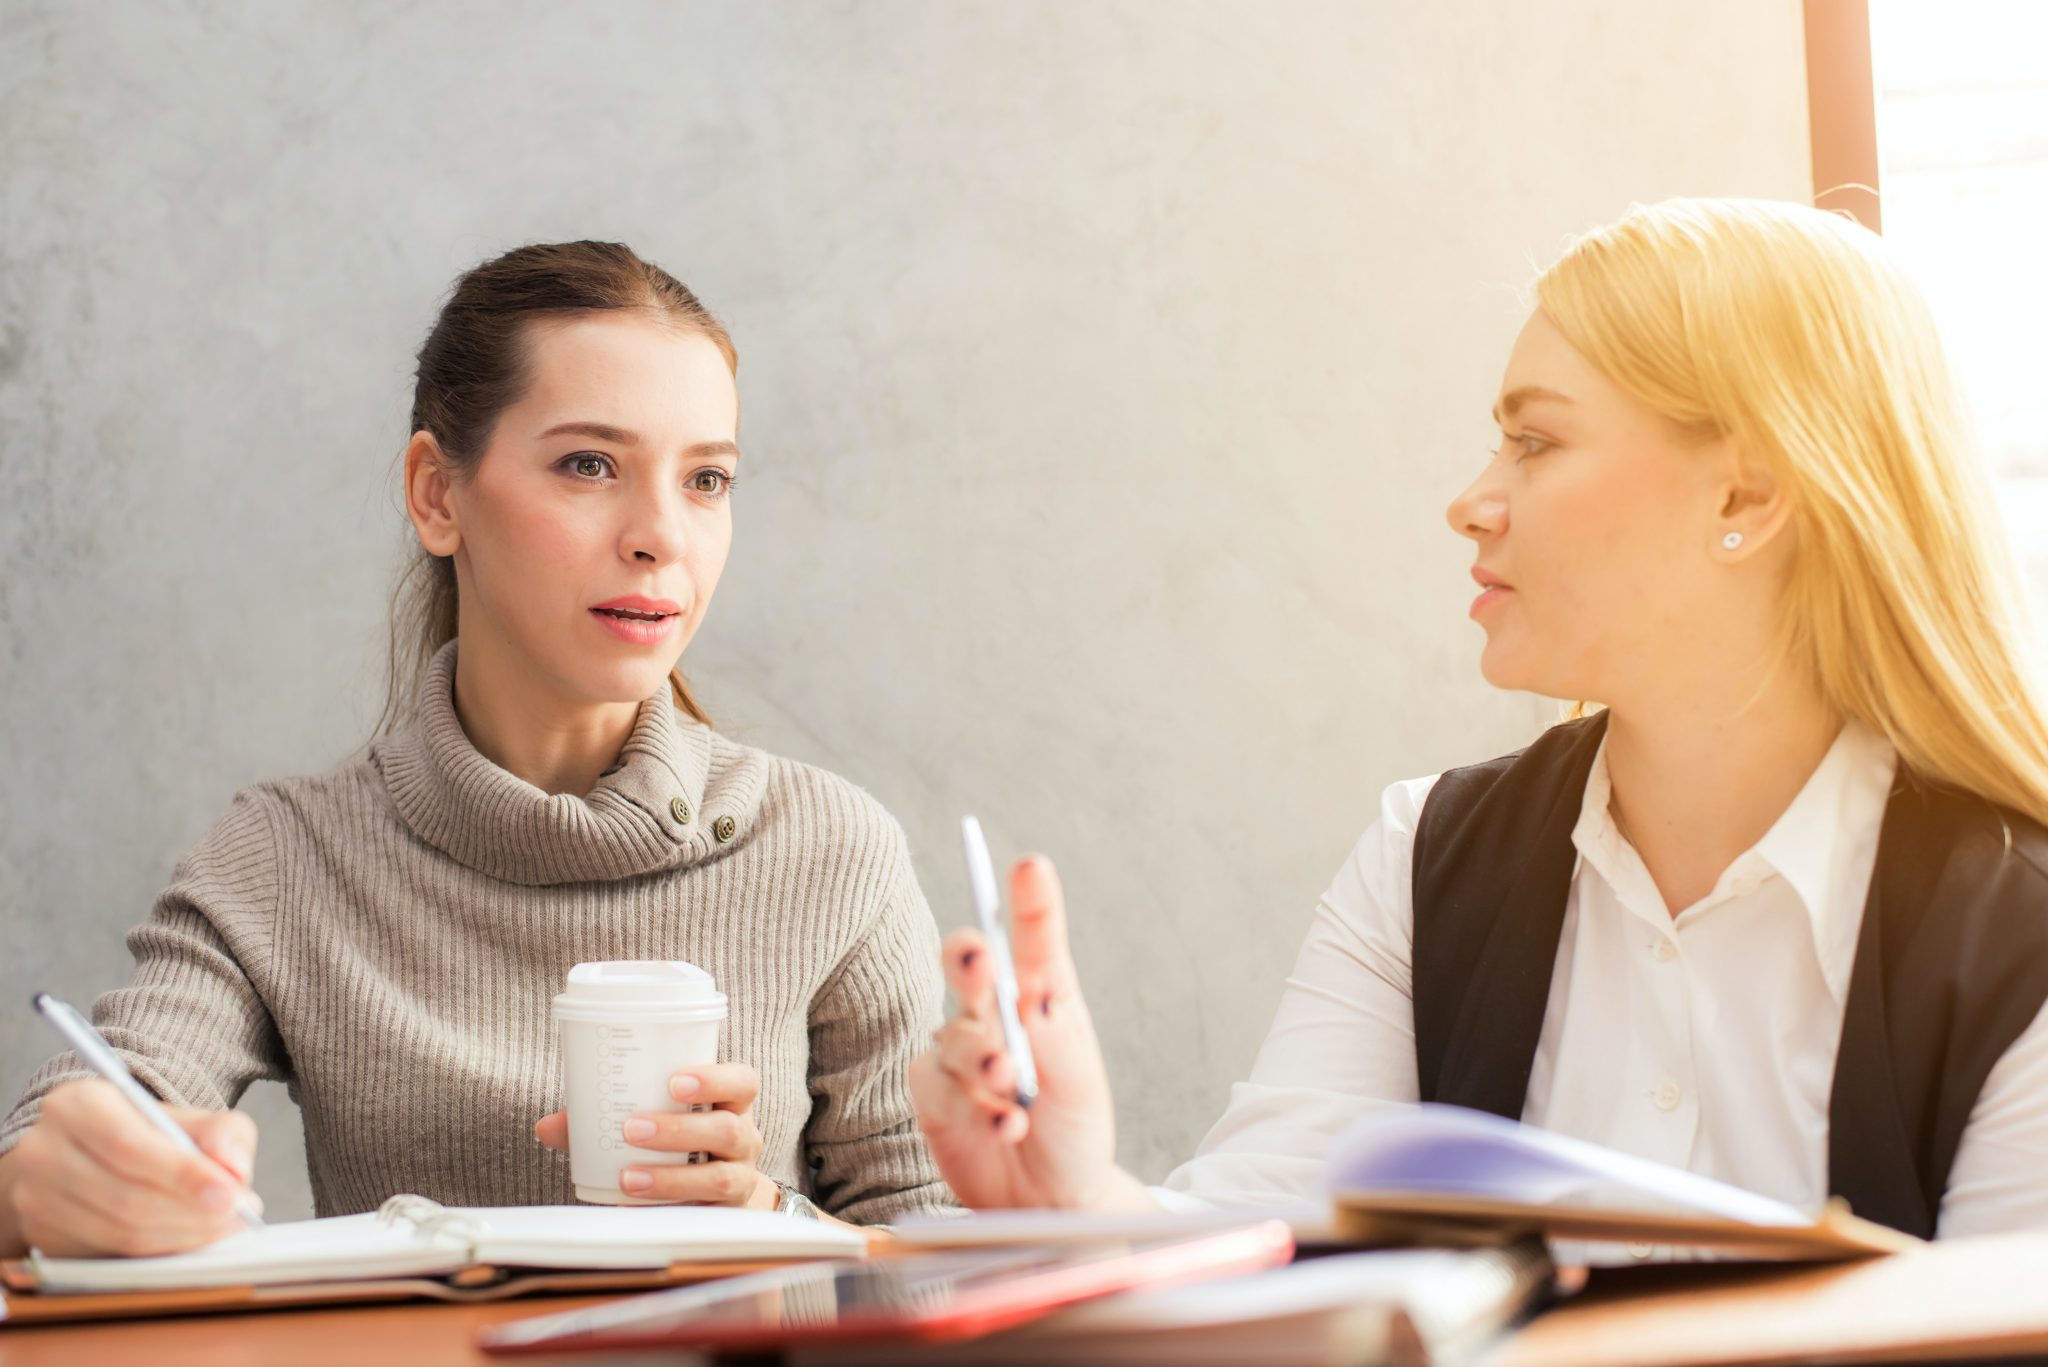 Building recruitment relationships